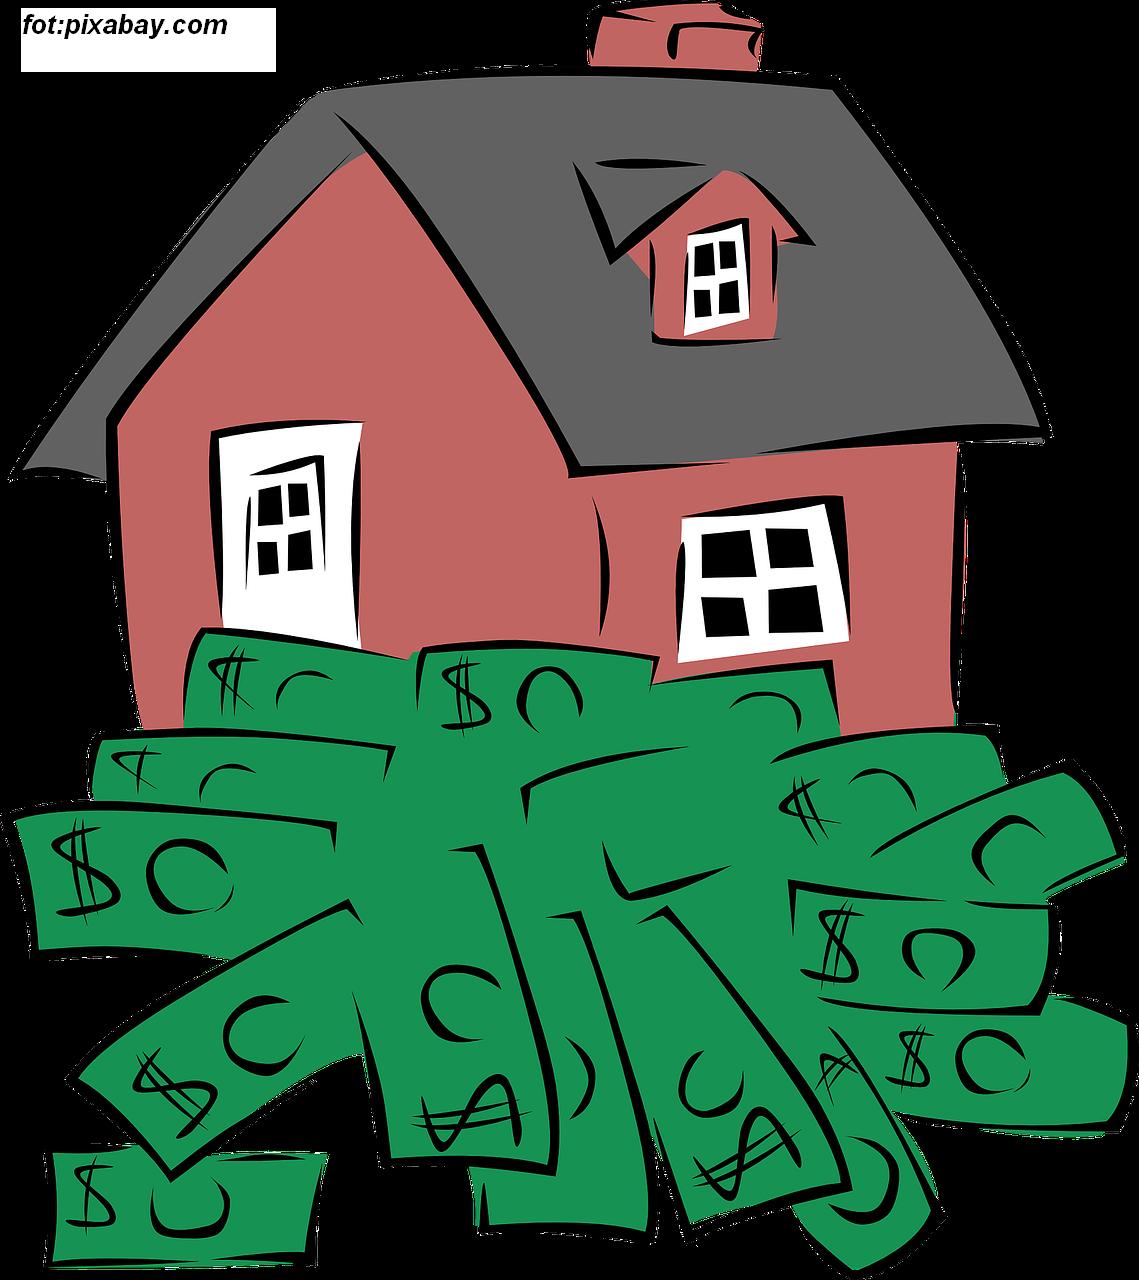 dom kredyty